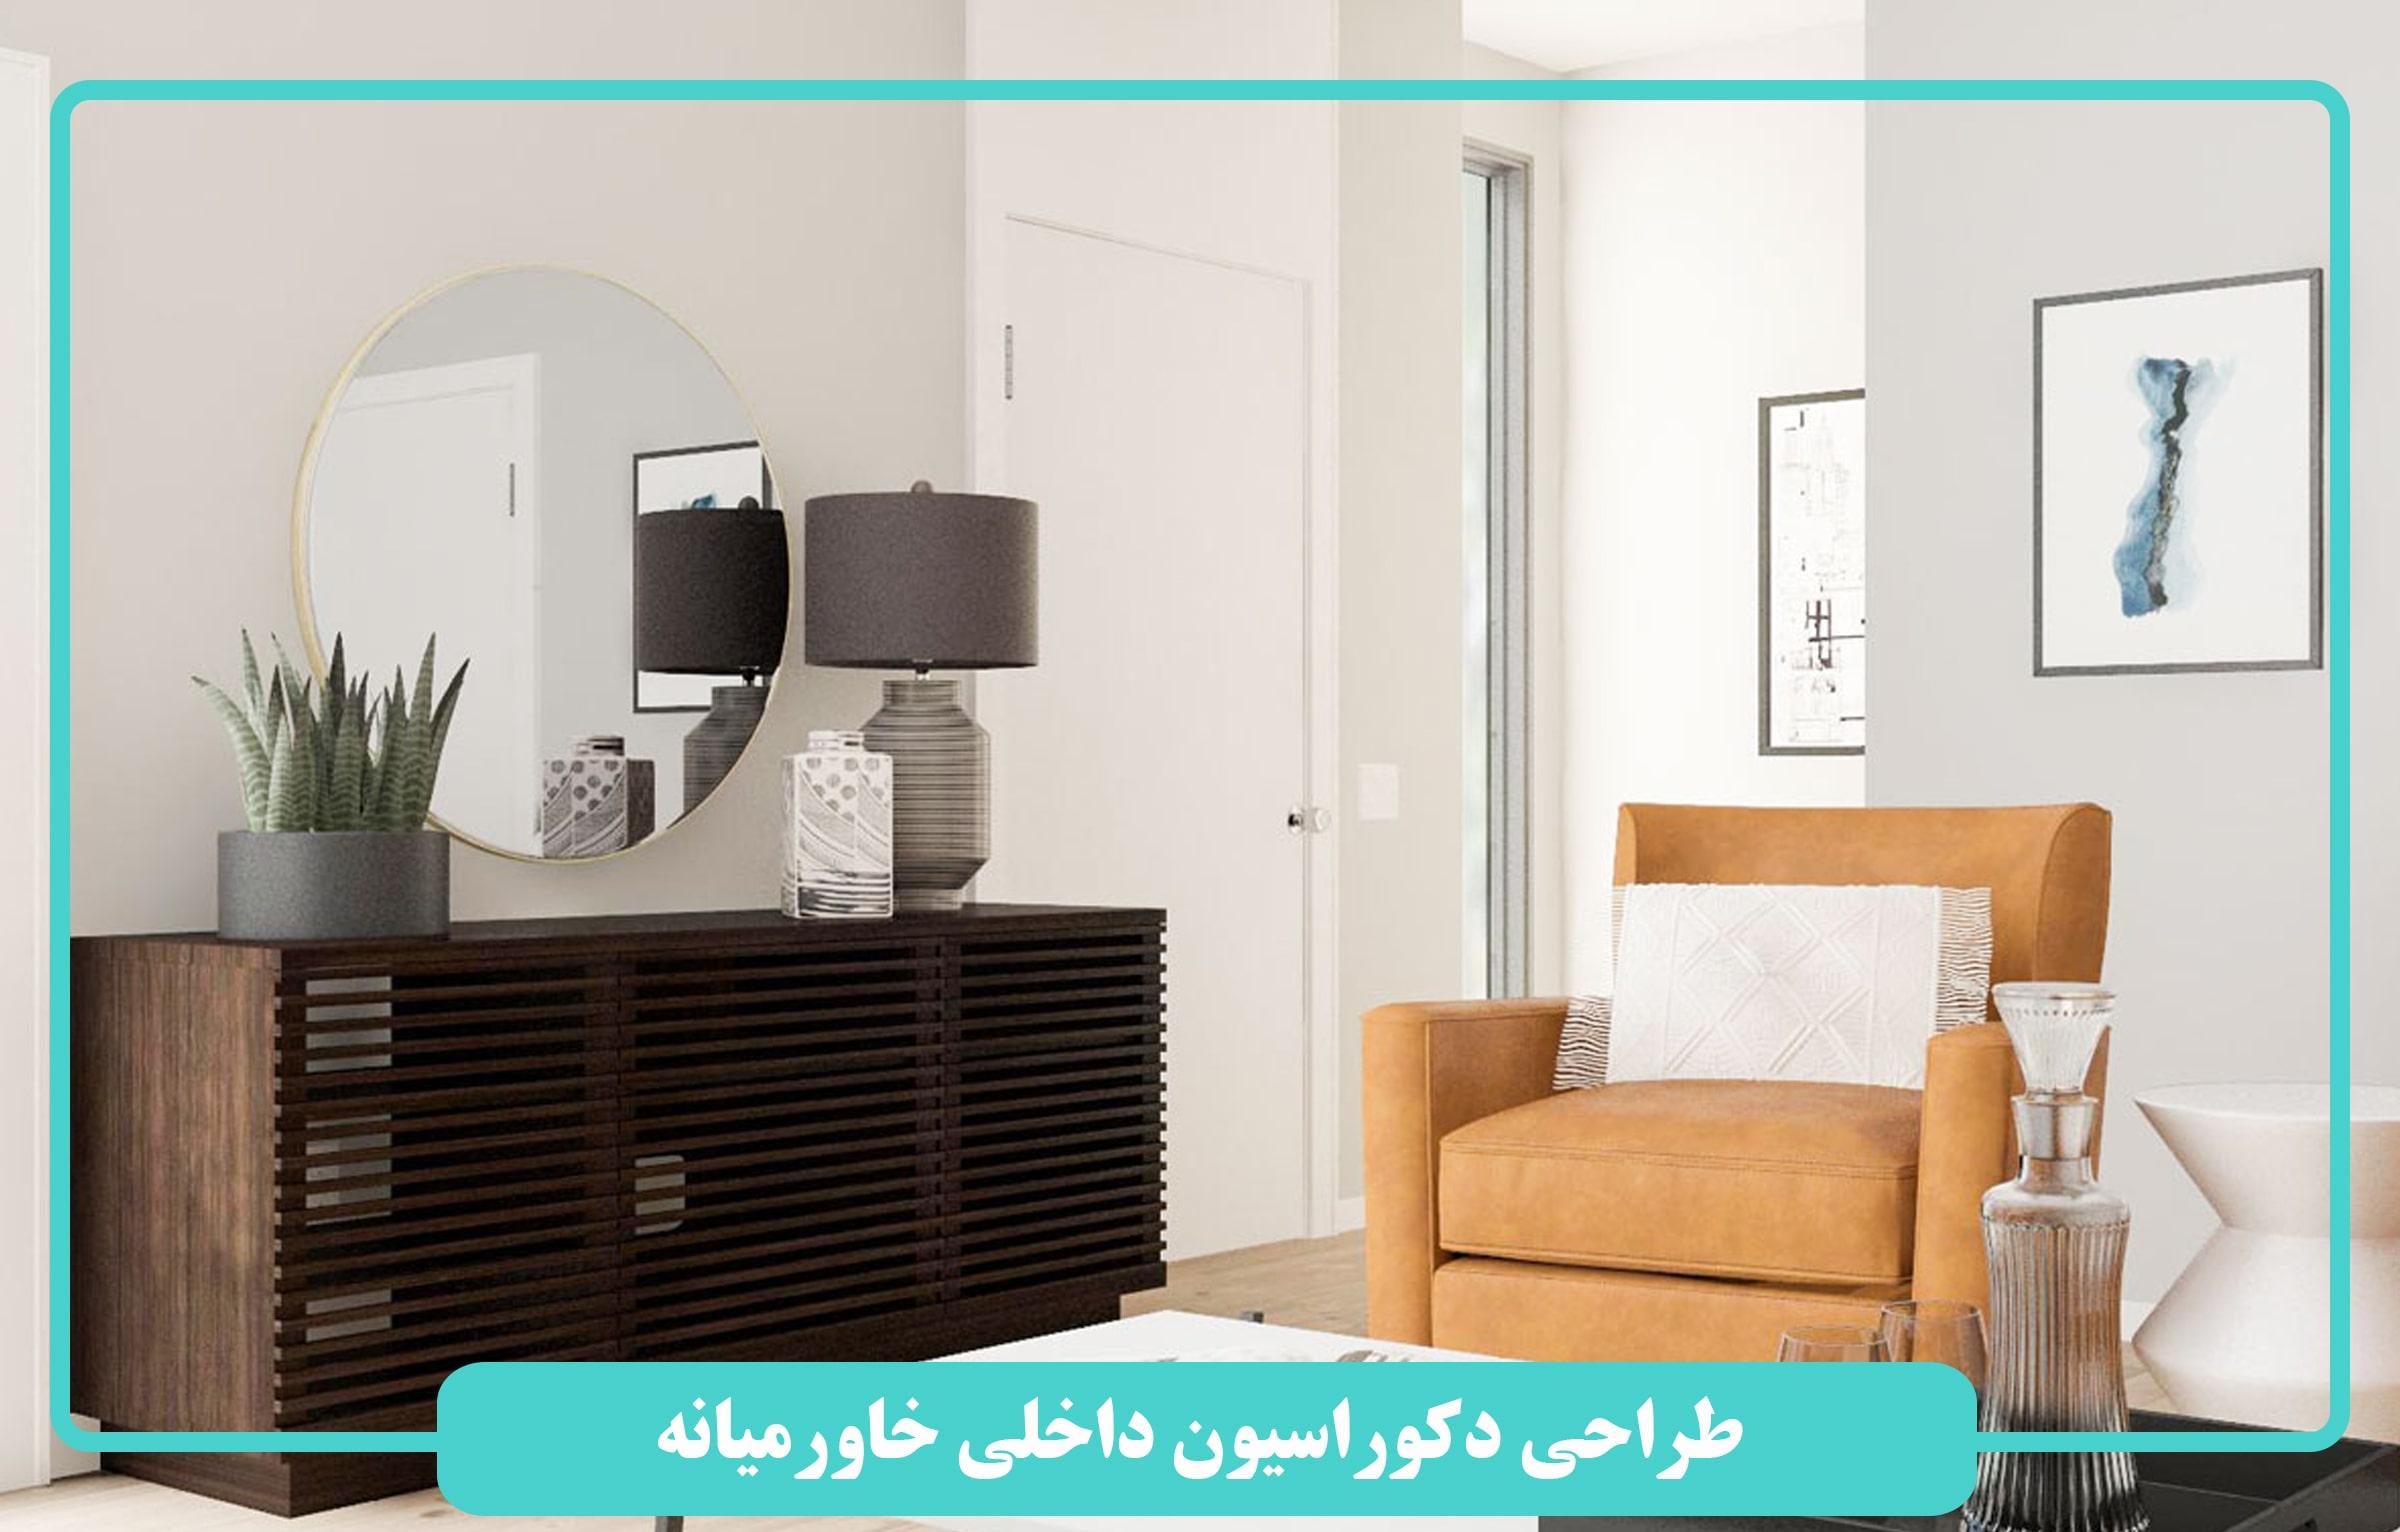 طراحی دکوراسیون داخلی خاورمیانه